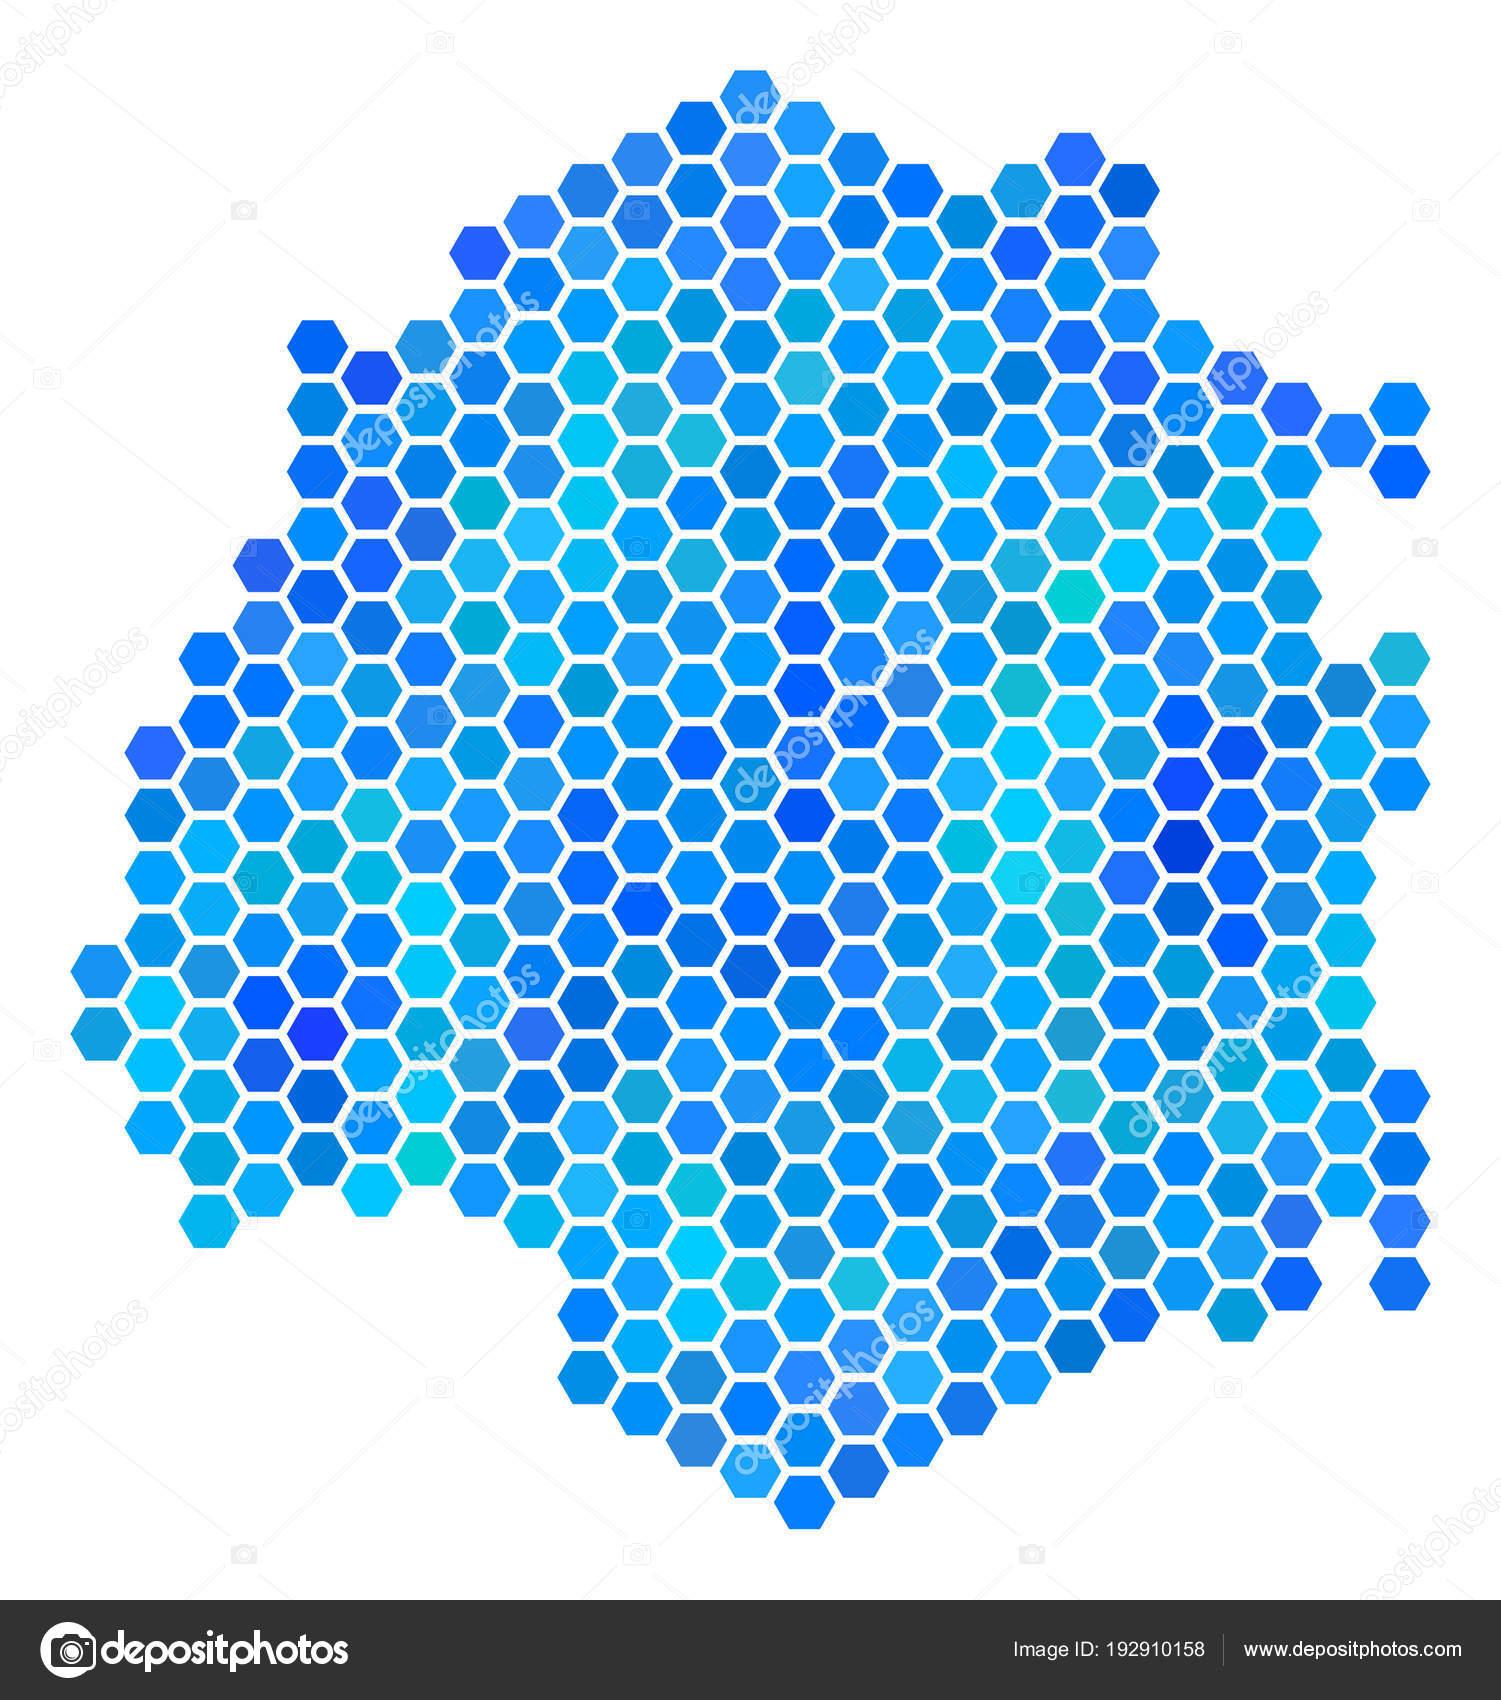 Thassos Greece Map.Blue Hexagon Thassos Greek Island Map Stock Vector C Ahasoft